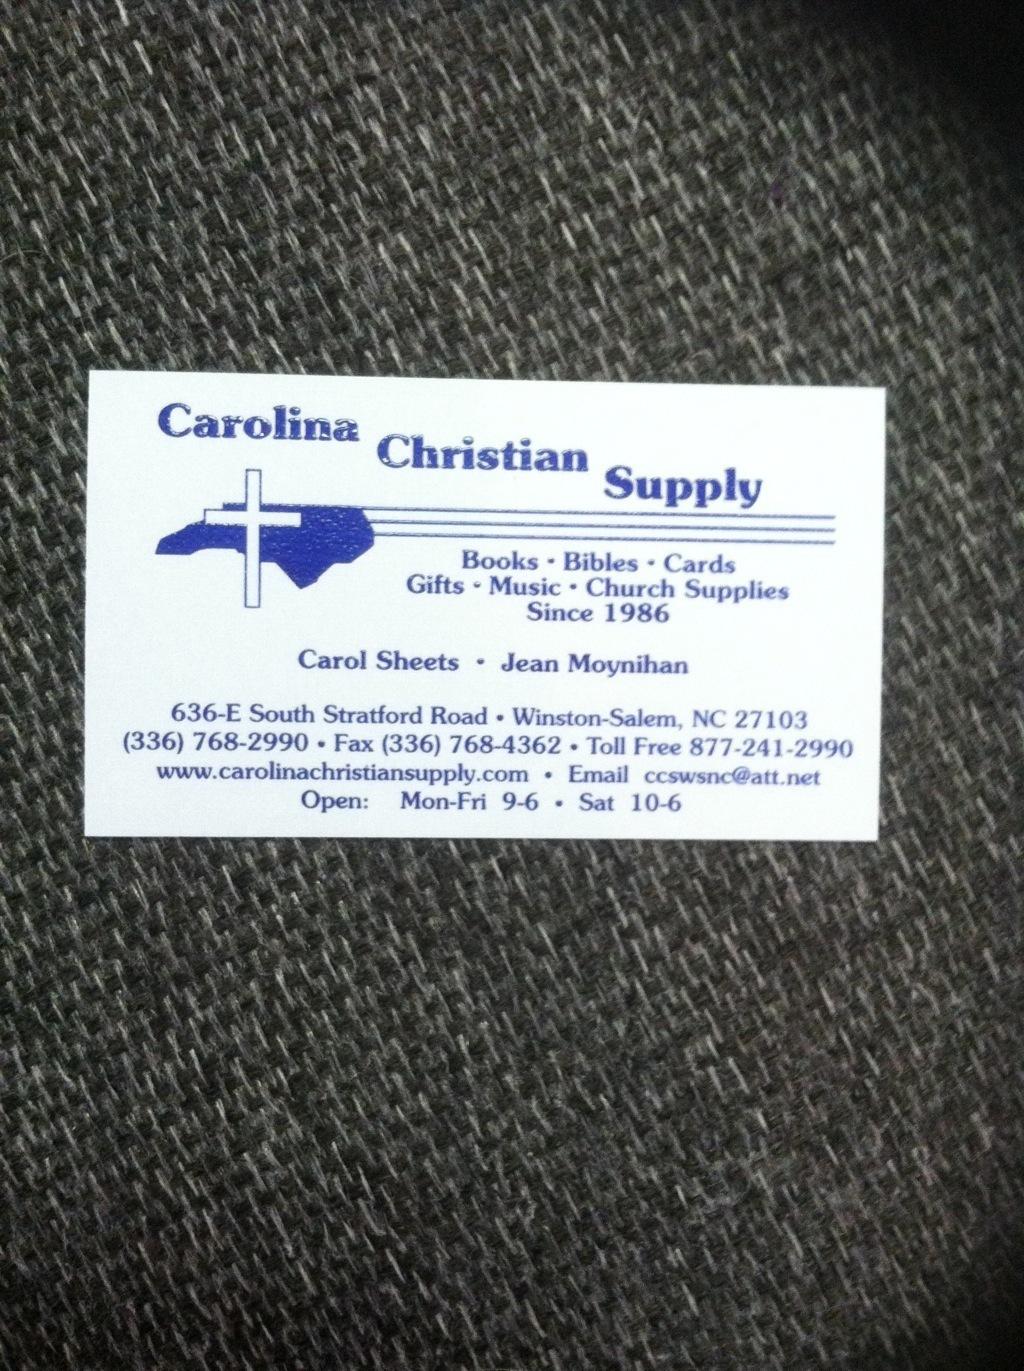 Carolina Christian Supply